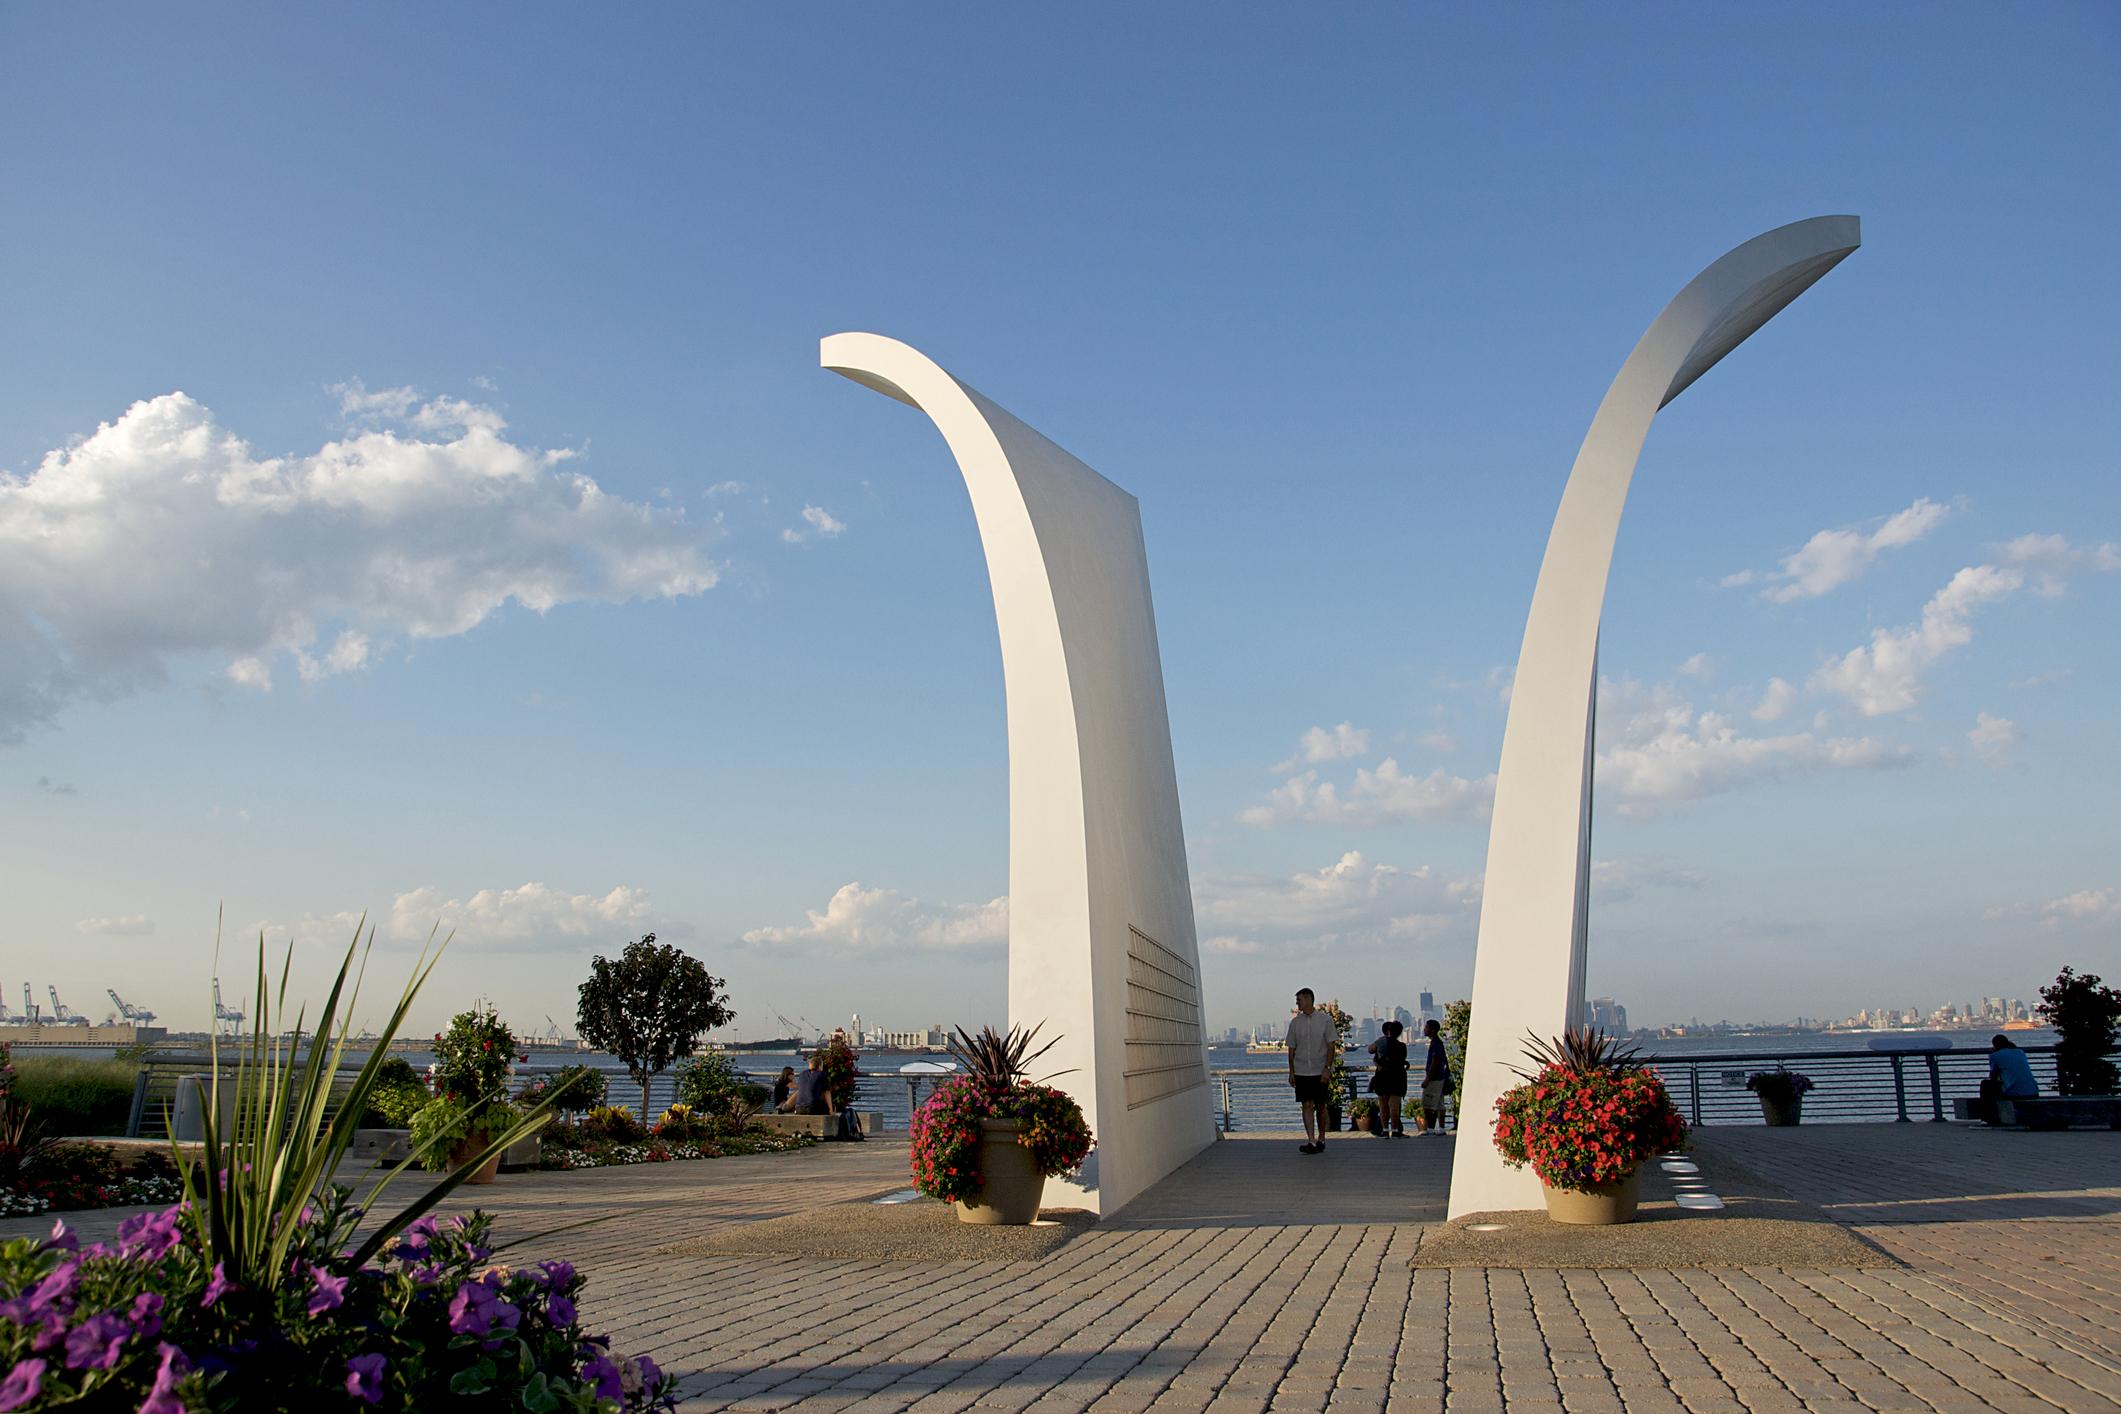 Memorial staten island ferry terminal st george